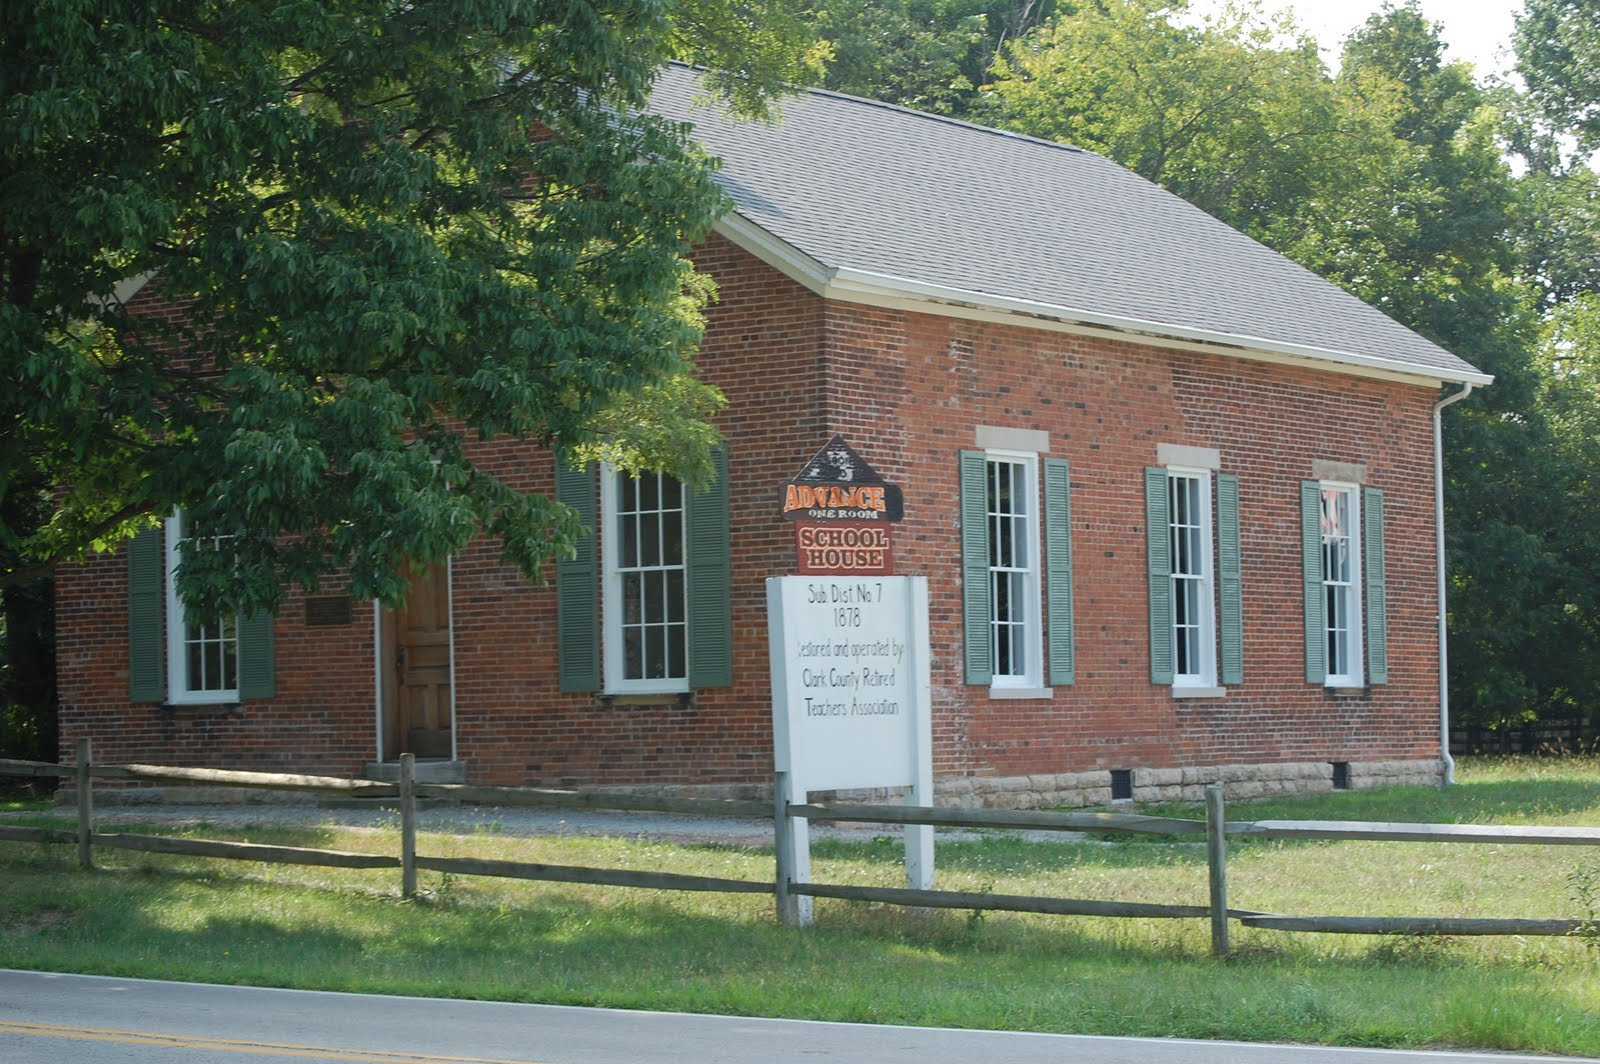 Ohio clark county new carlisle - Ohio Clark County New Carlisle 44